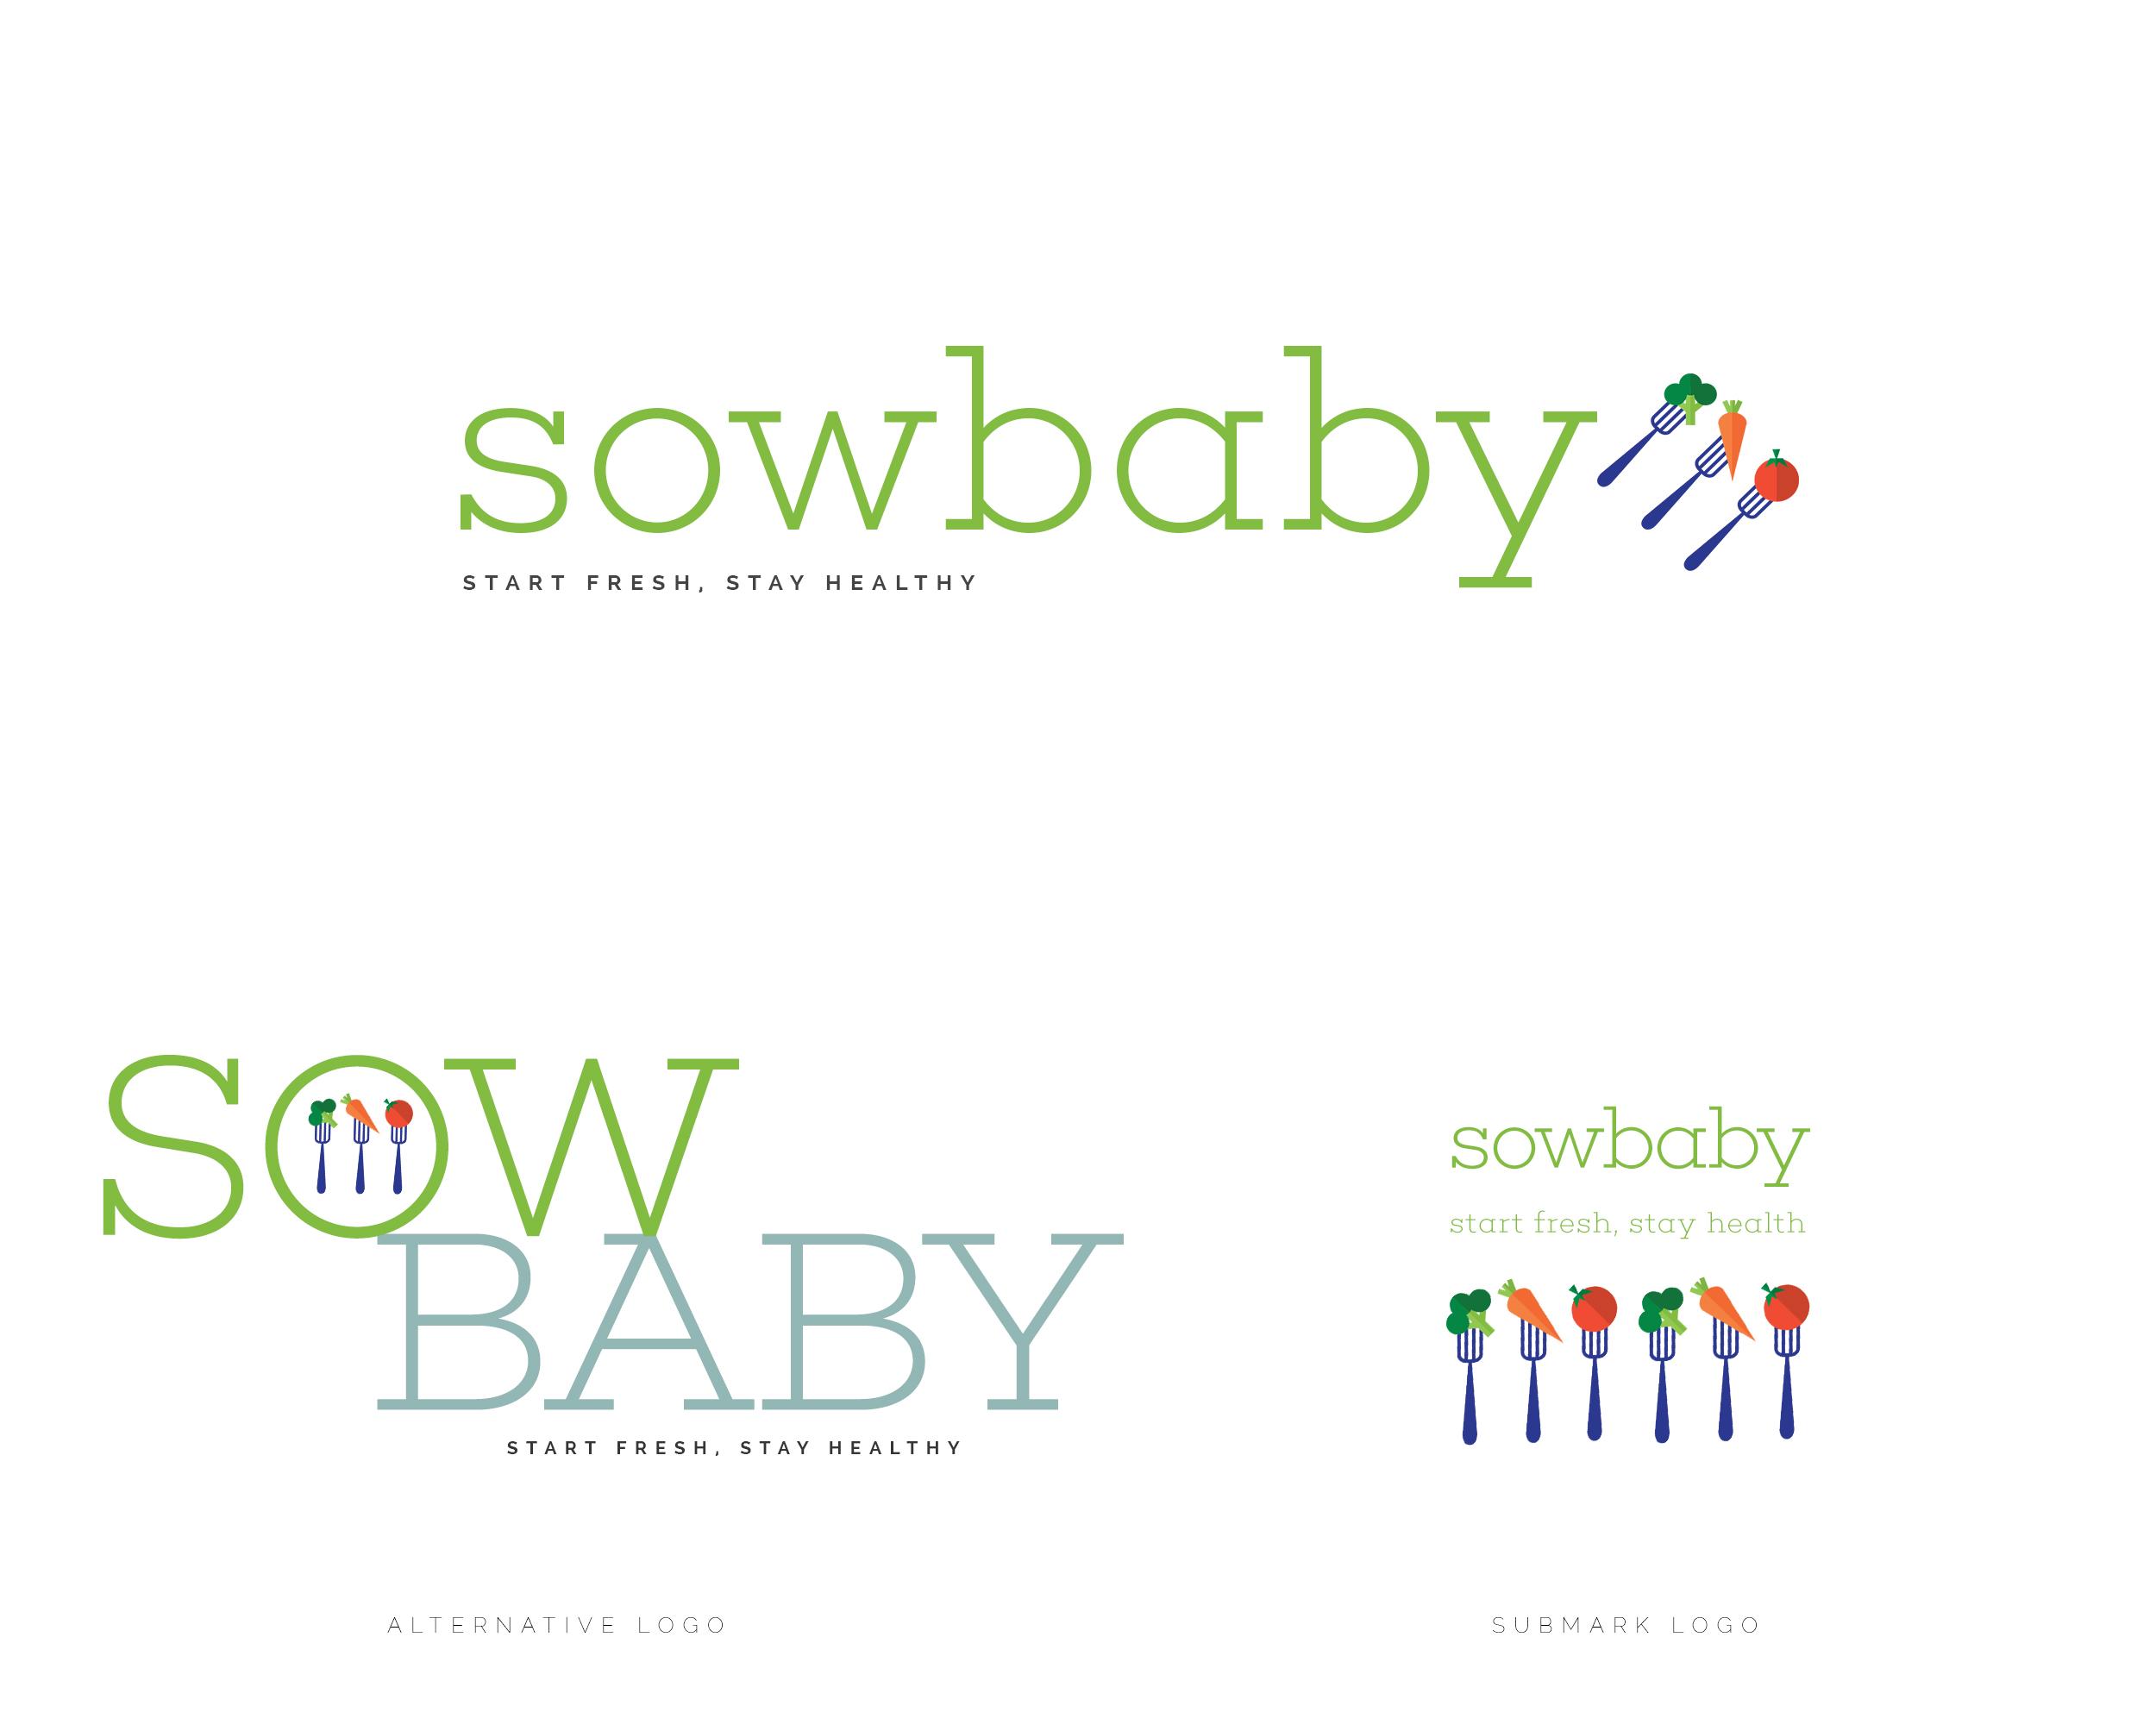 sow baby logo 4.jpg